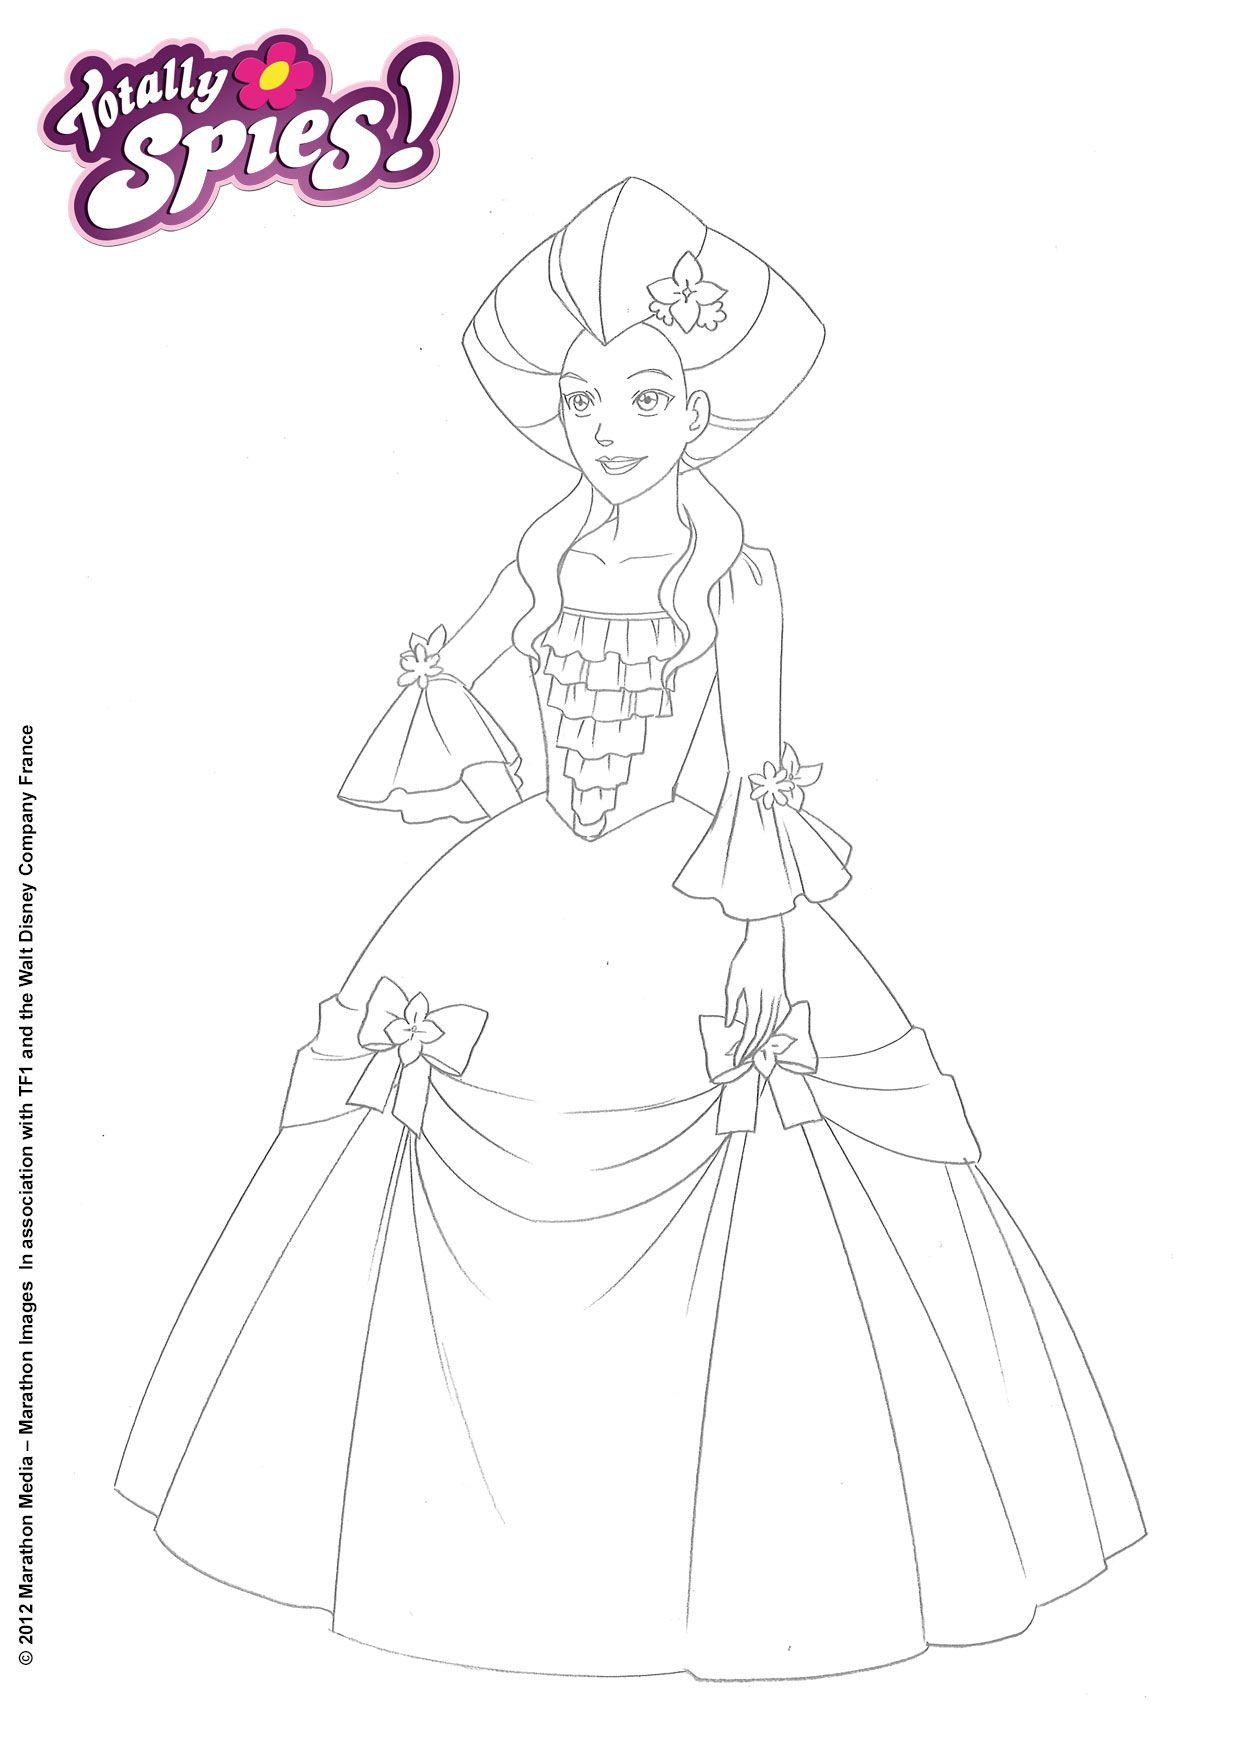 Beau Dessin à Imprimer Princesse Et Prince